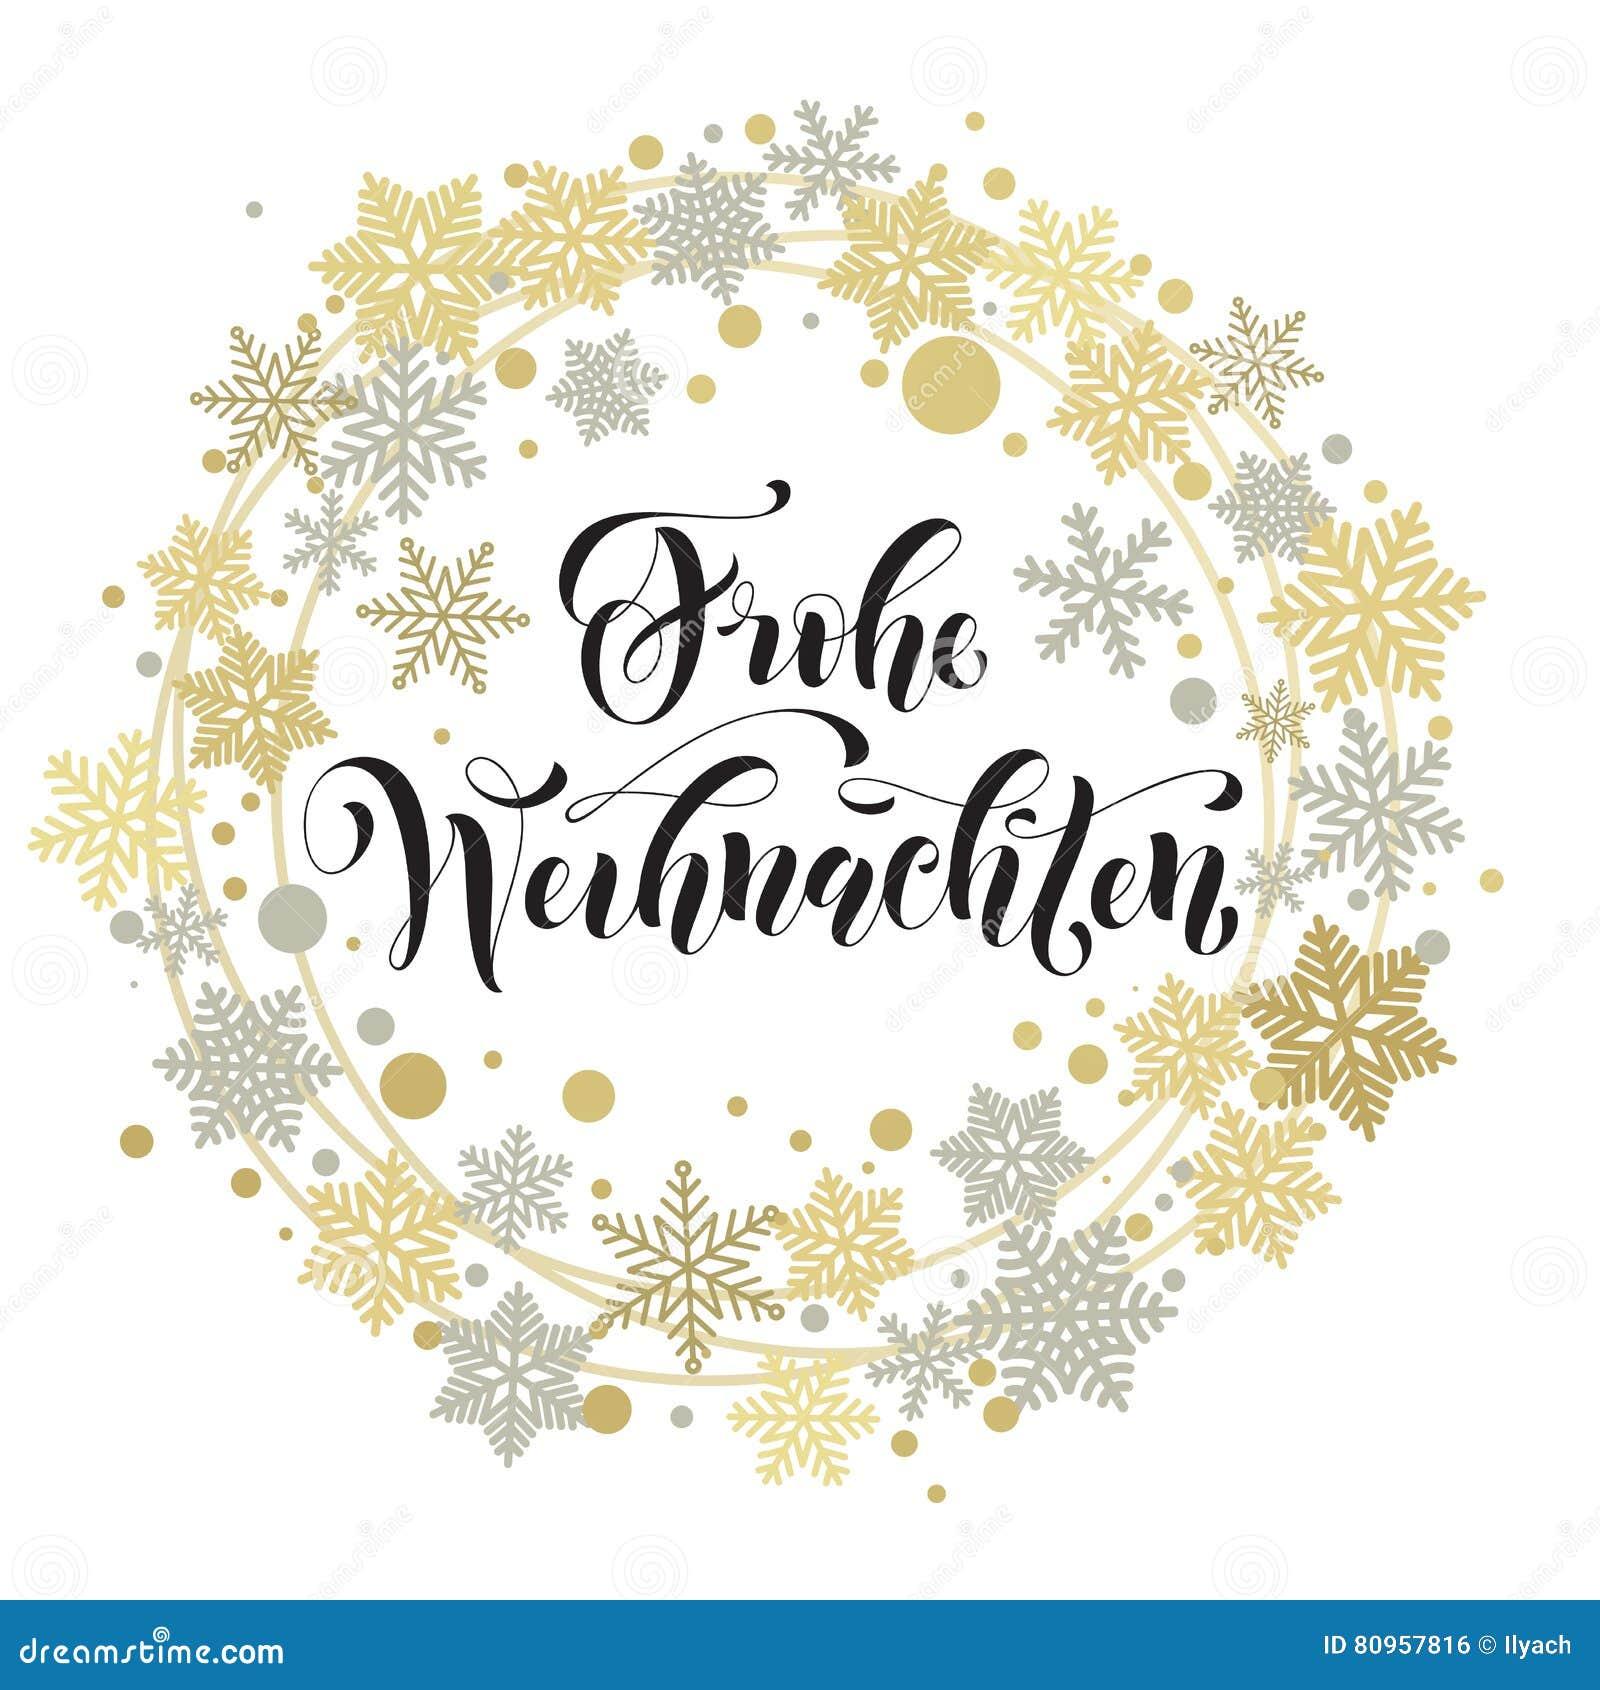 German Merry Christmas Text Weihnachten Greeting Card Stock